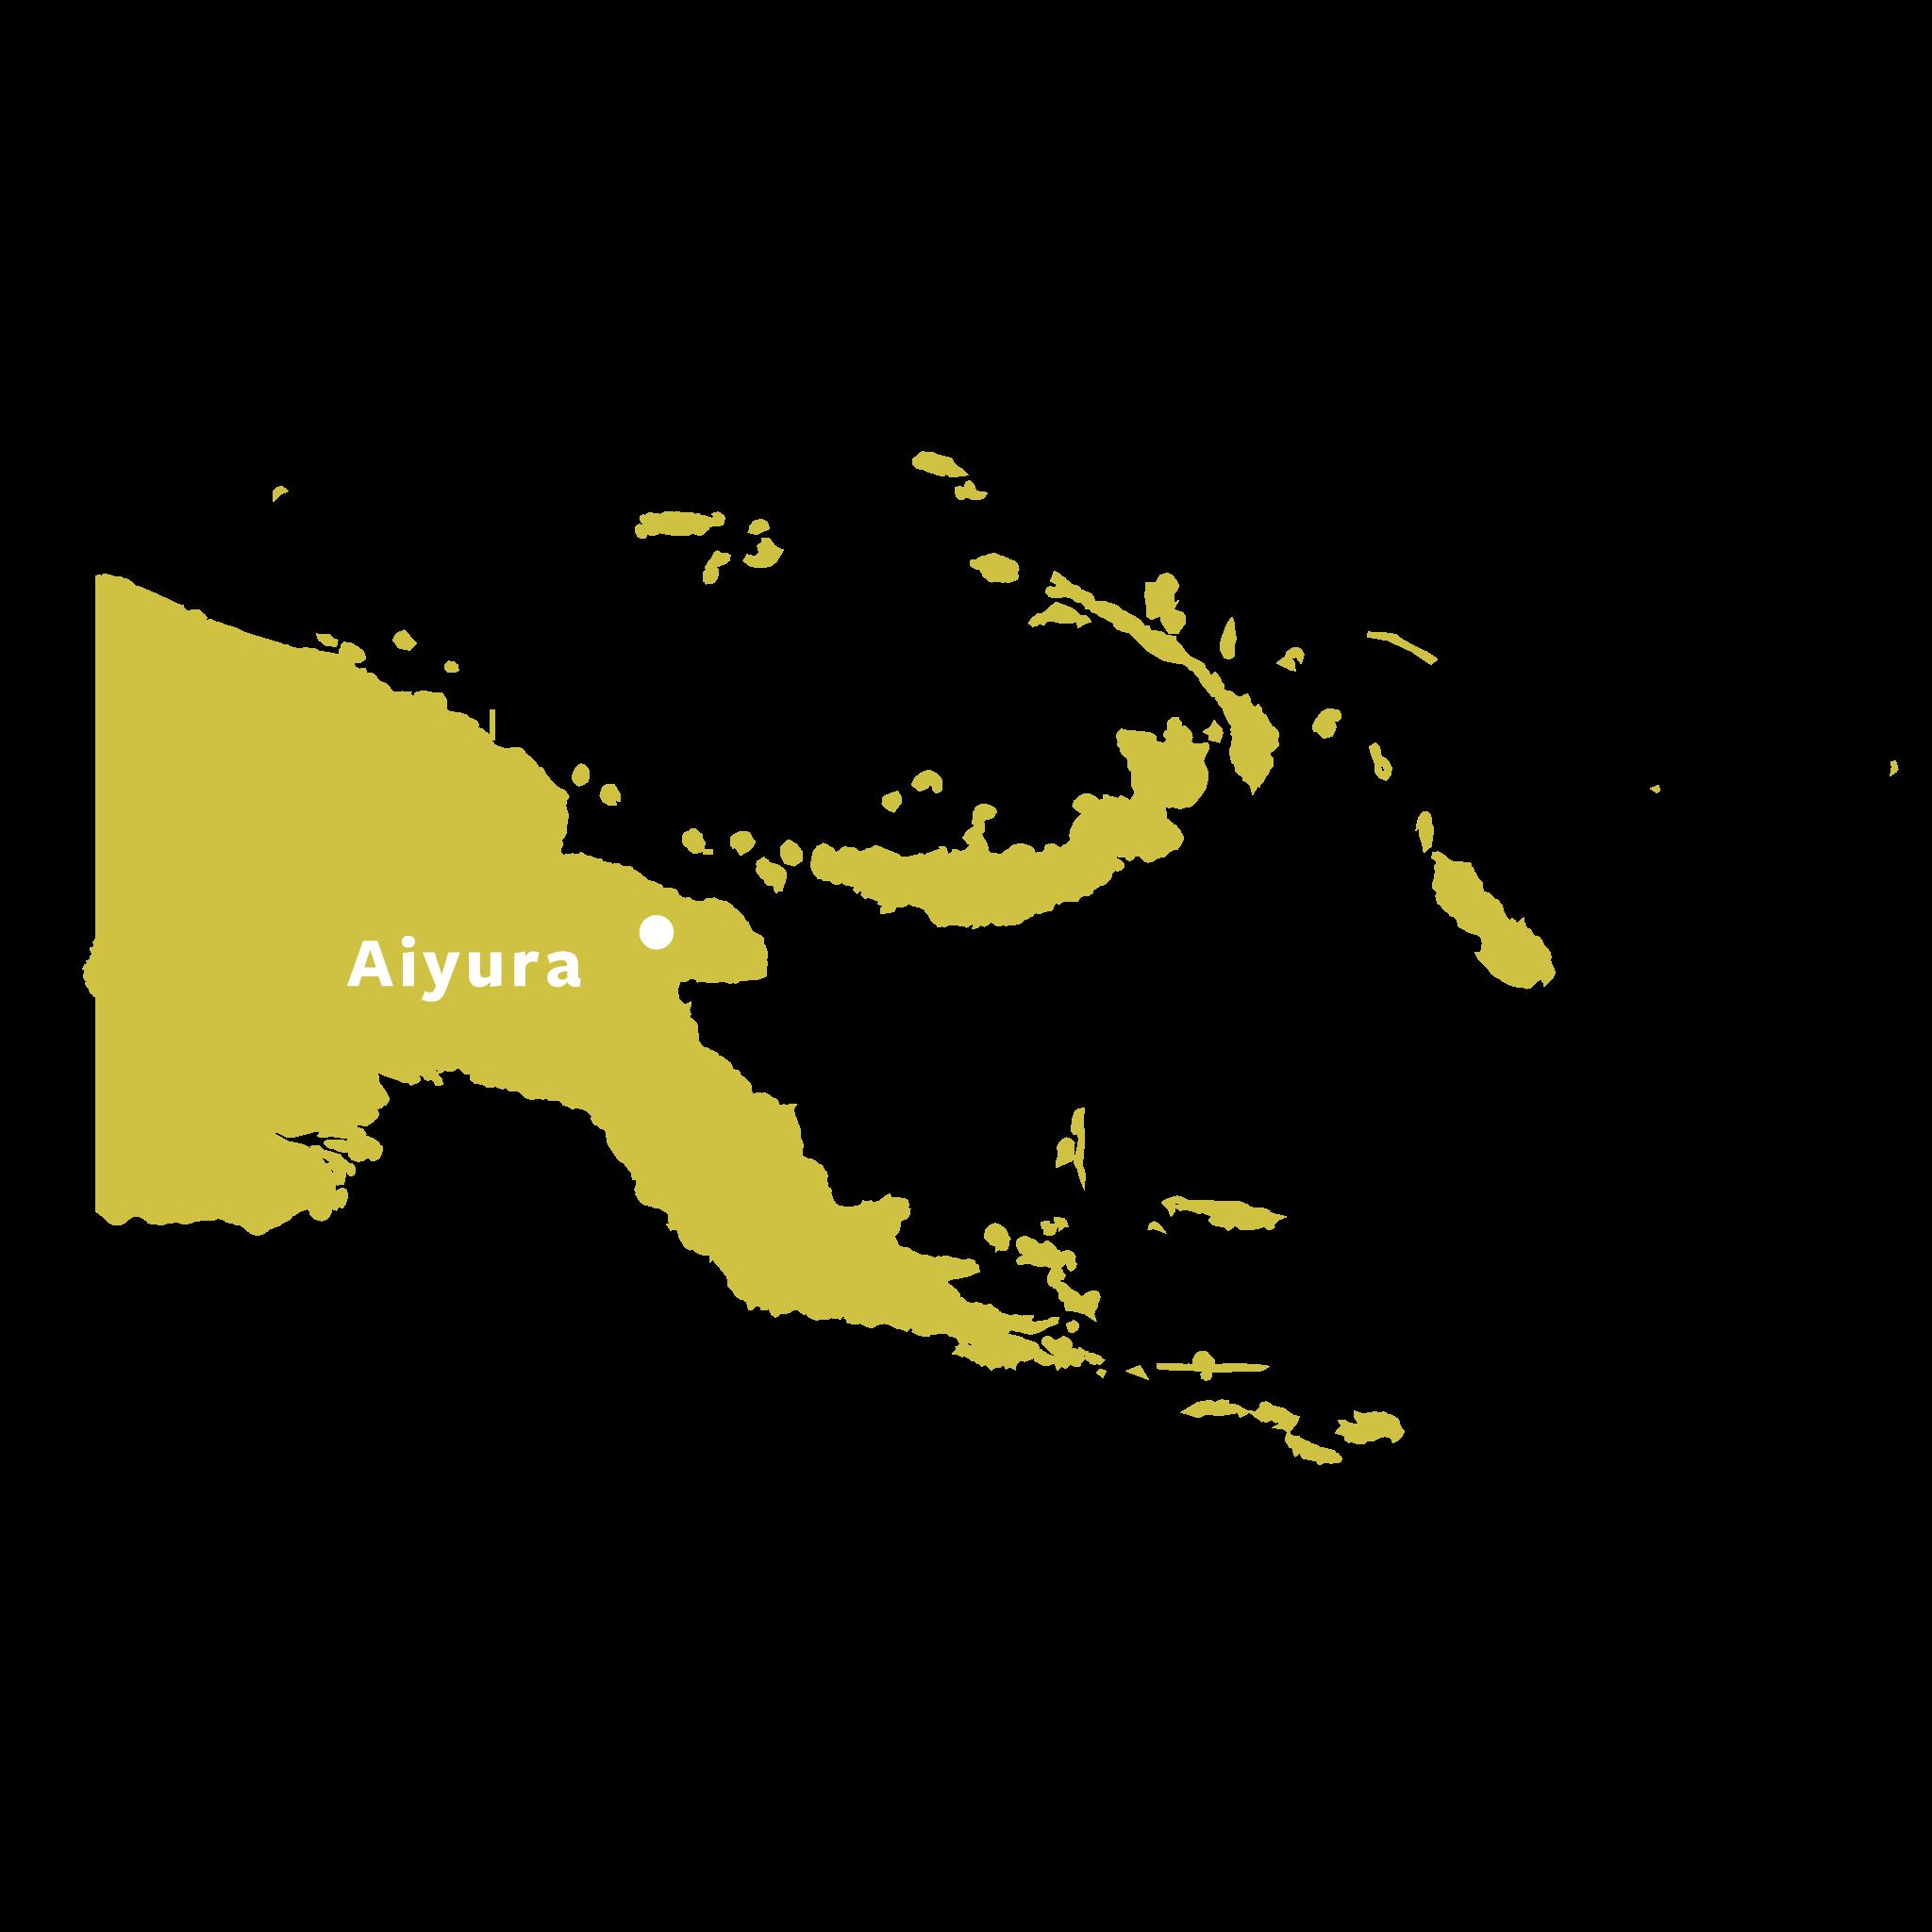 Map of Aiyura, Eastern Highlands, Papua New Guinea